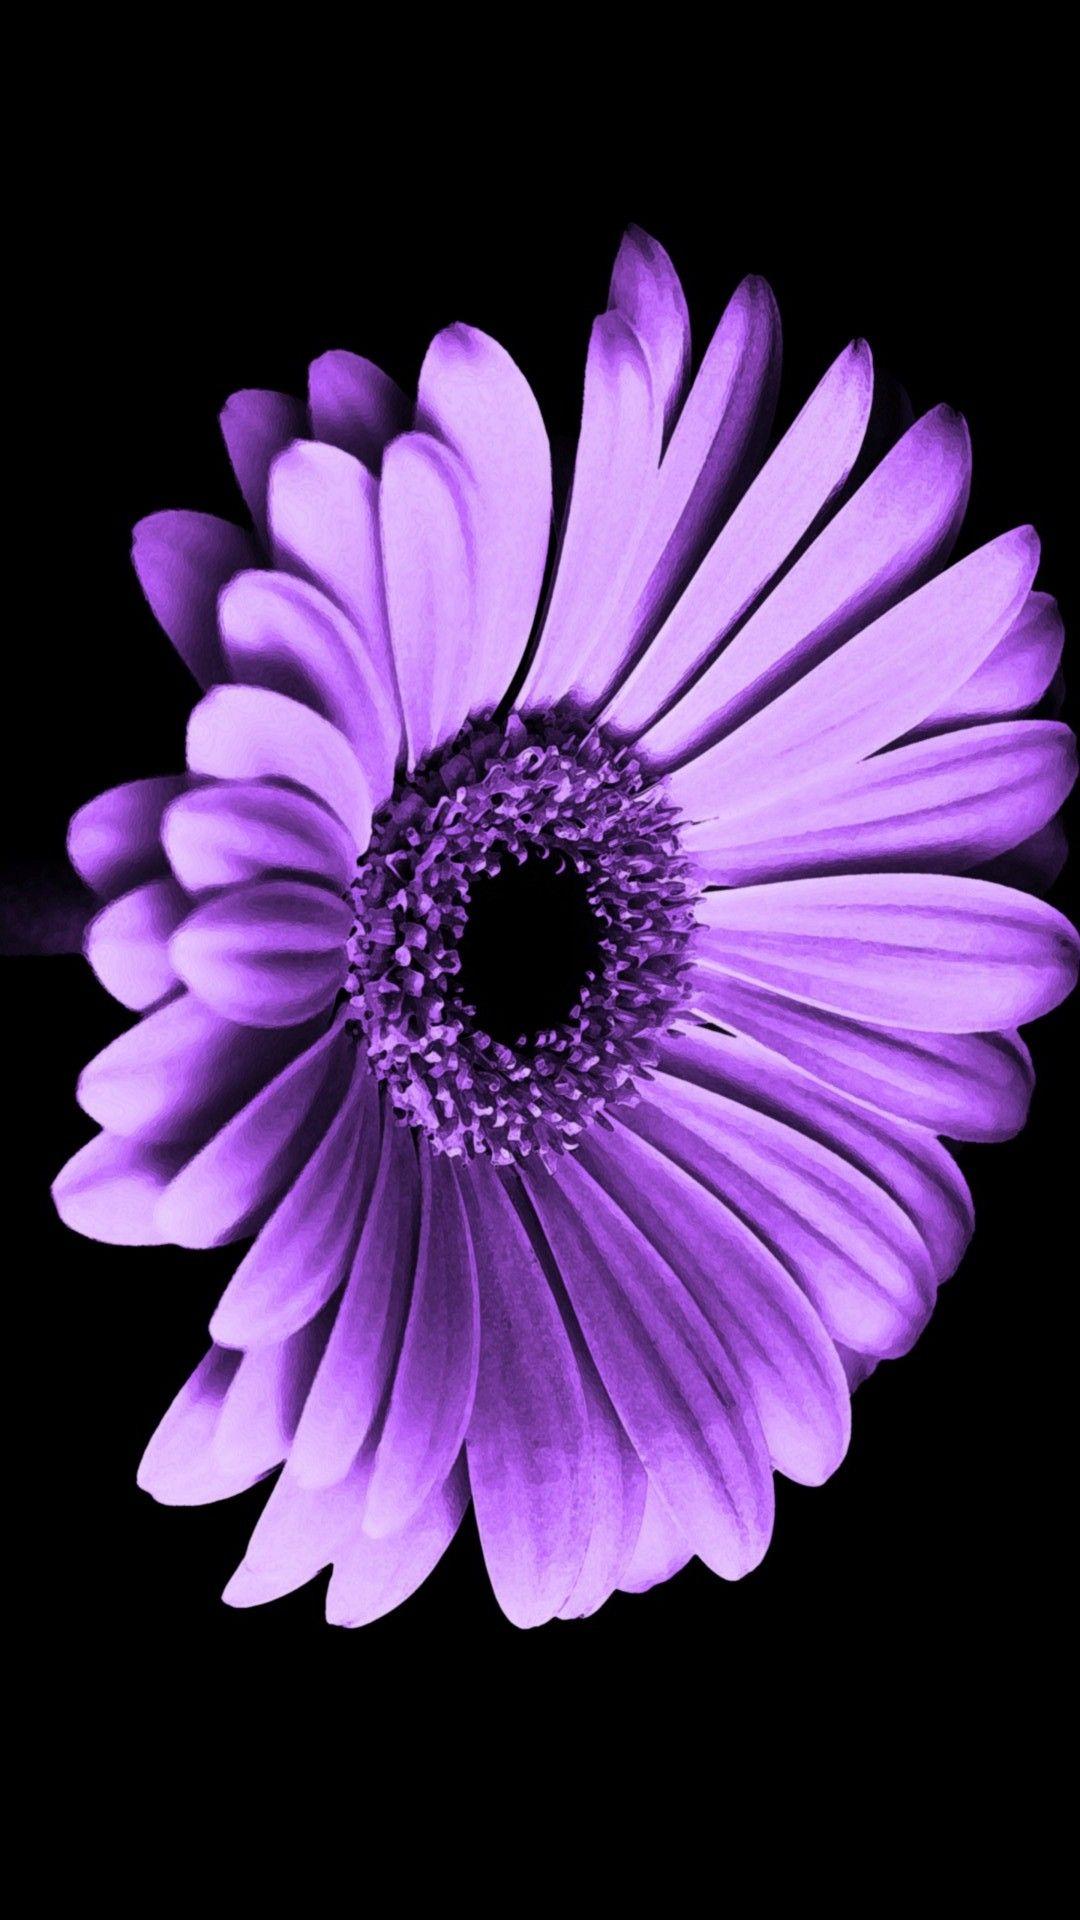 Violet Daisy Flower iPhone Wallpaper Best iPhone